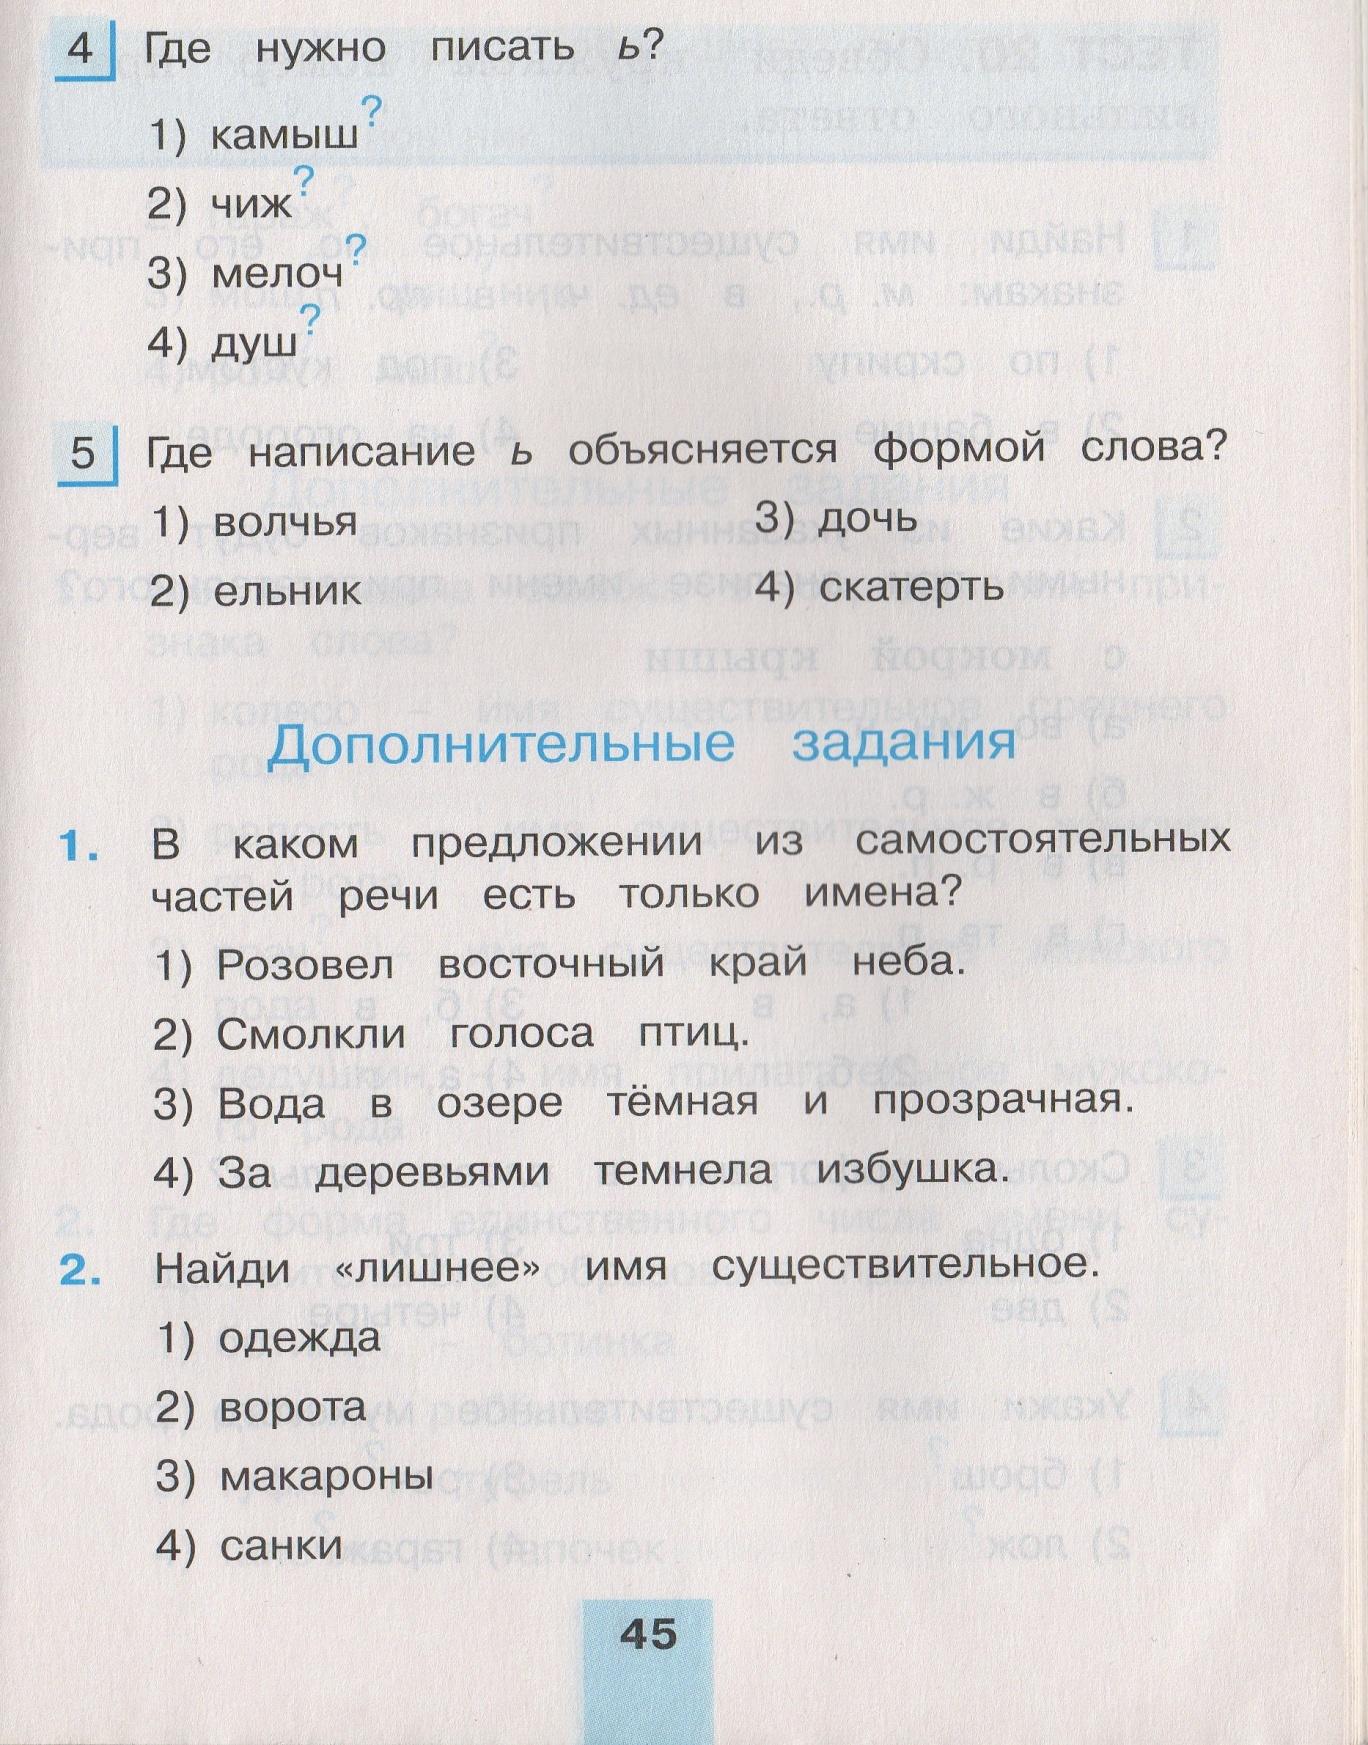 Диктанты по русскому языку 3 класс умк пнш